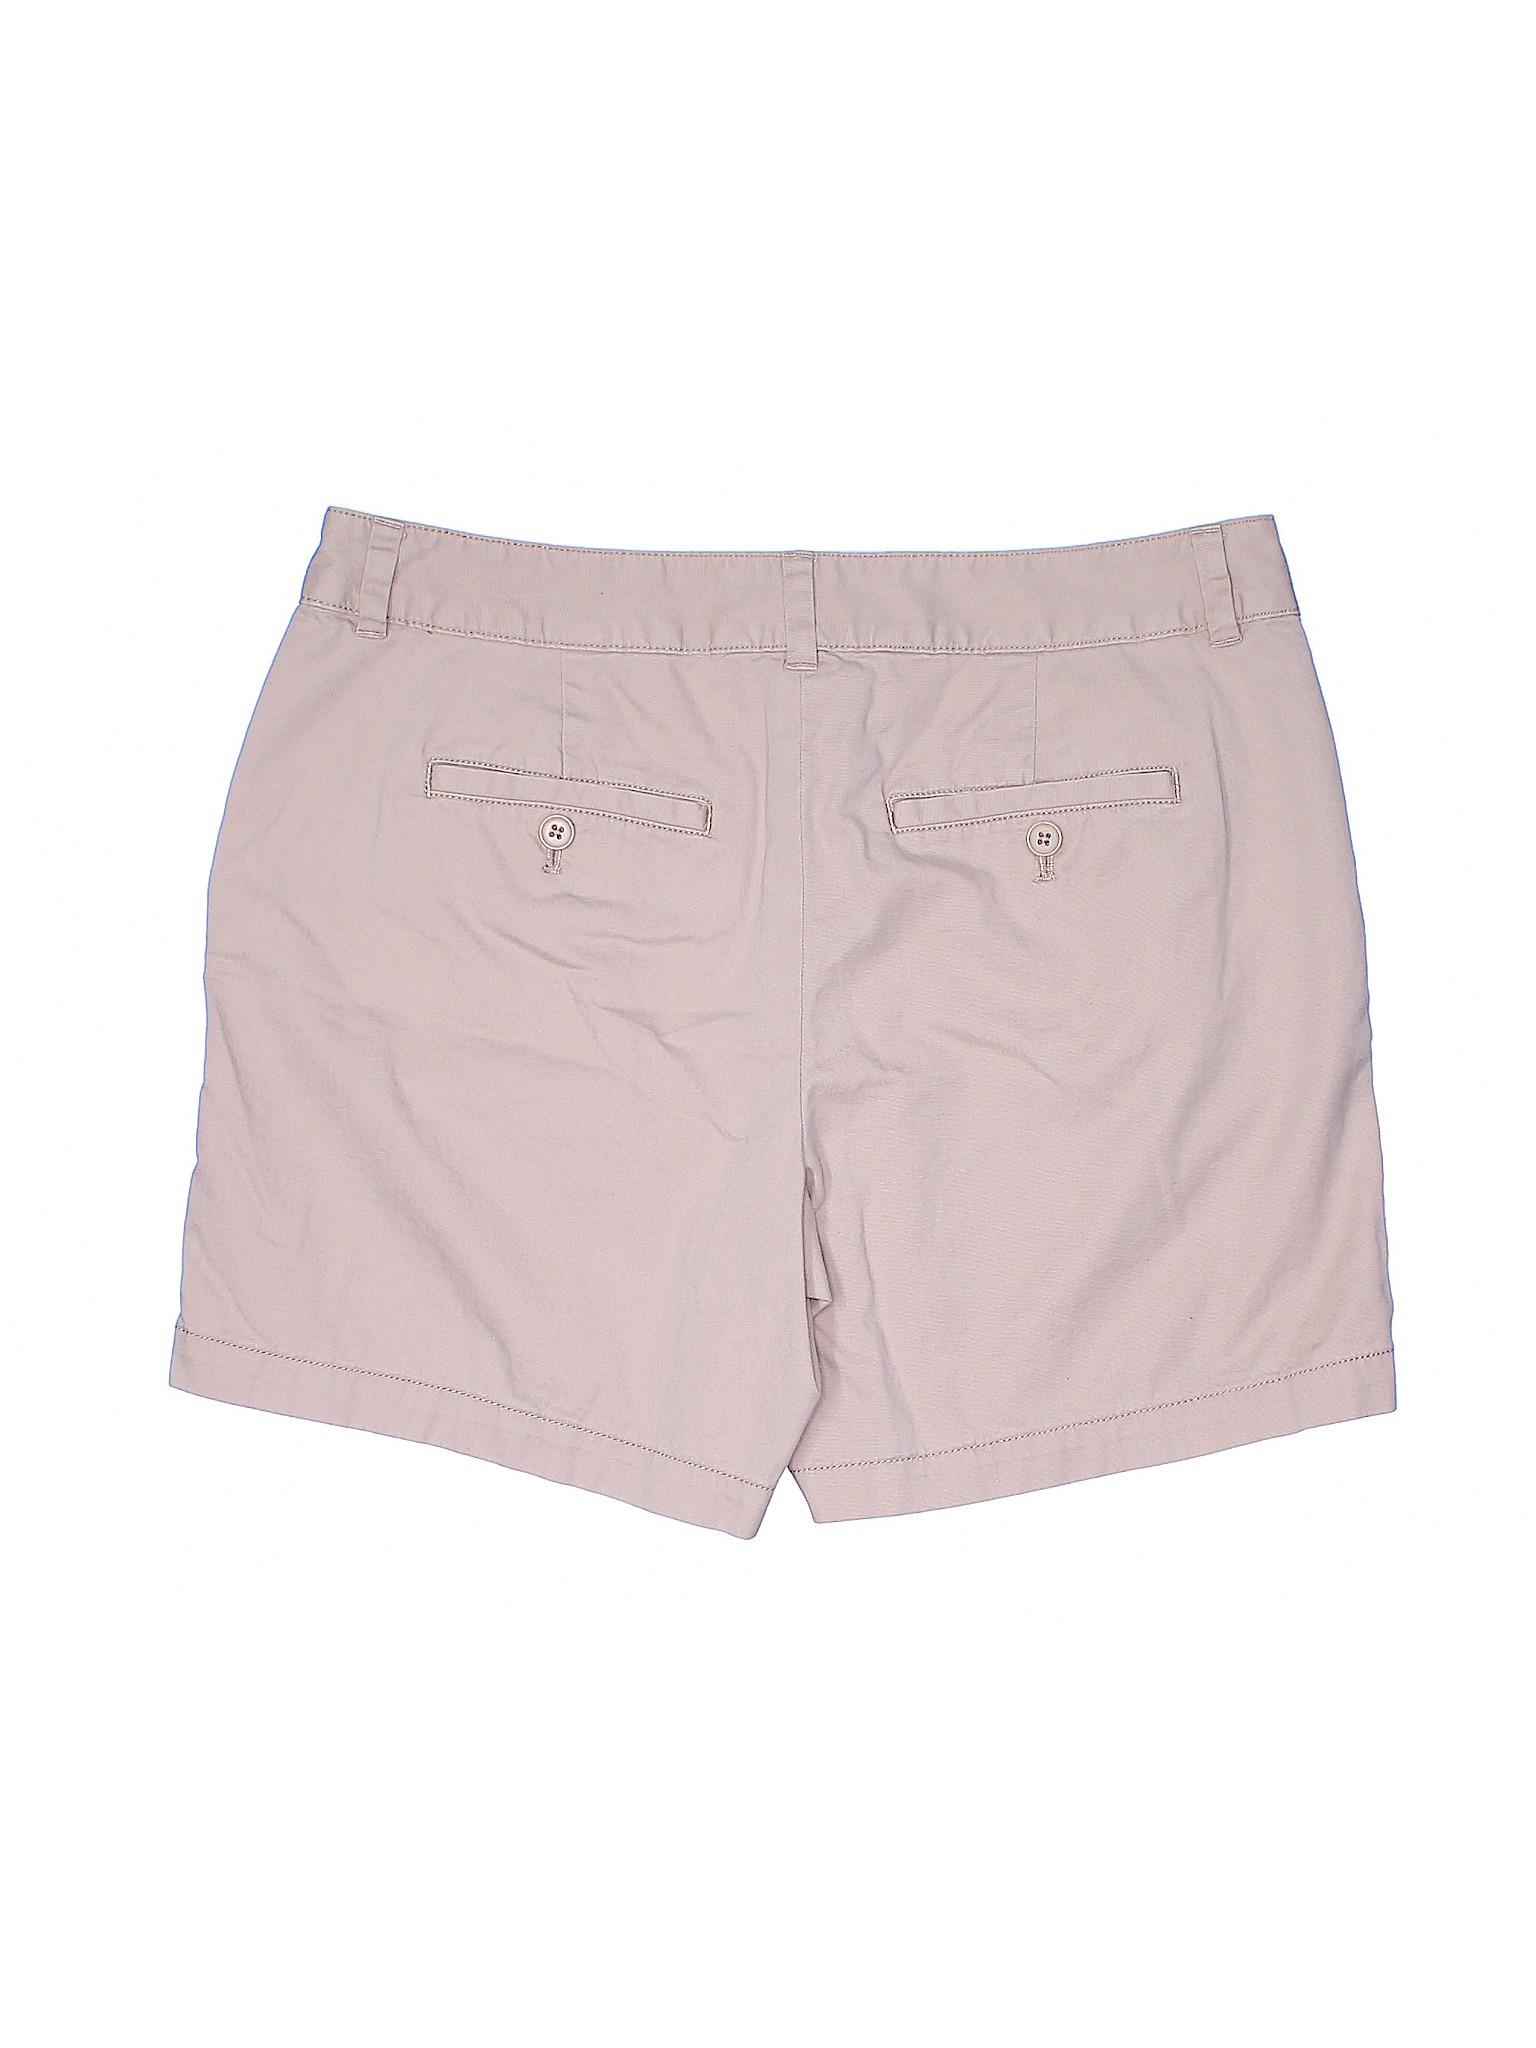 Shorts winter Khaki Taylor Boutique LOFT Ann Uvg8nqX